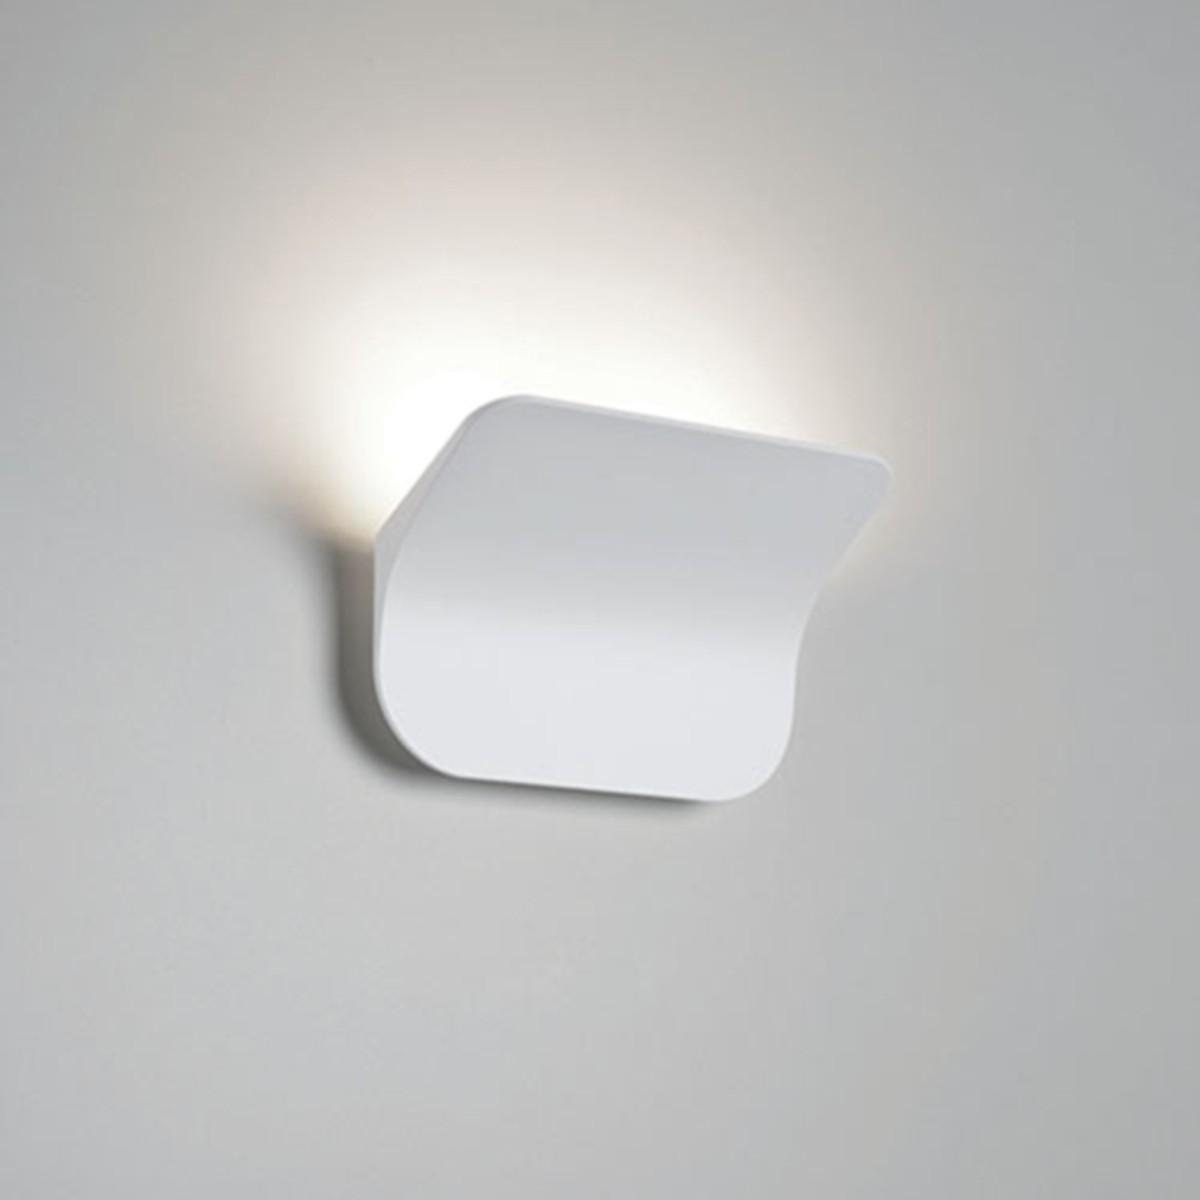 Rotaliana Tide W0 LED Wandleuchte, 2700 °K, weiß matt